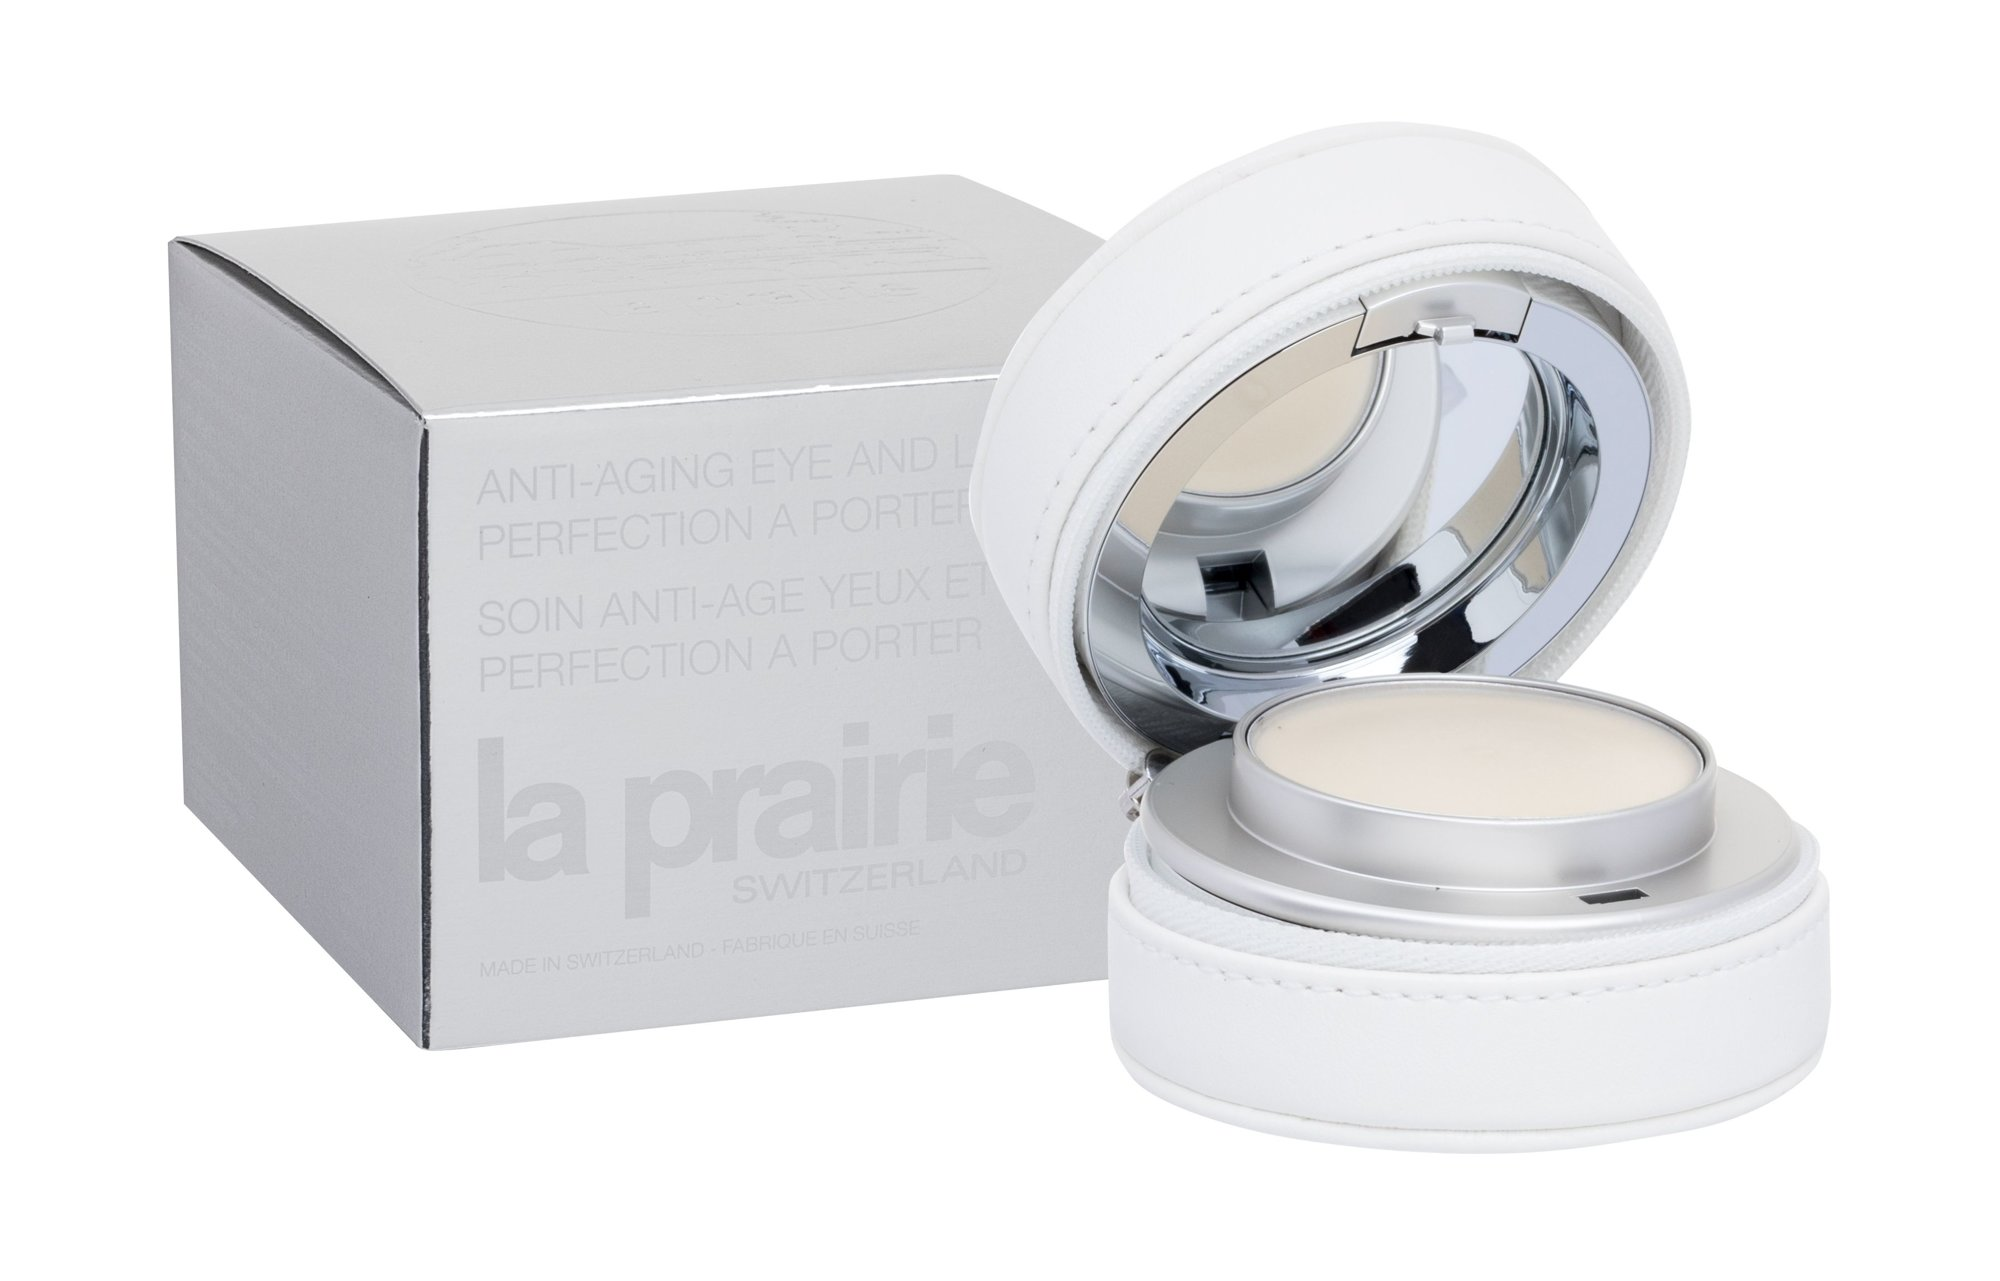 La Prairie Anti Aging Cosmetic 15ml